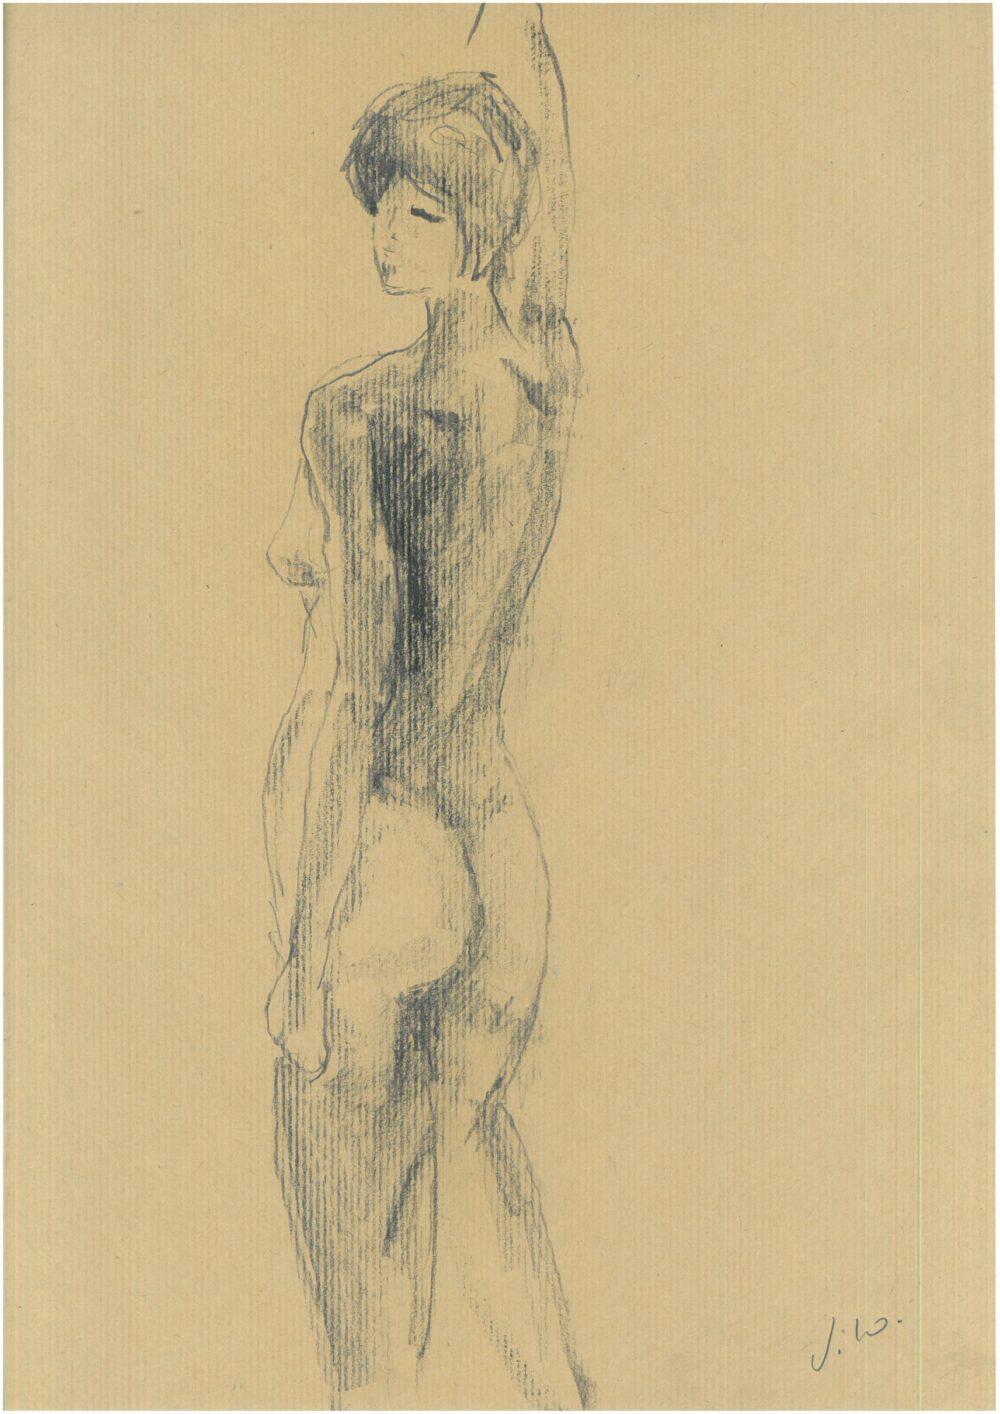 MONIKA 1 Victor Lorenzi bel'arti